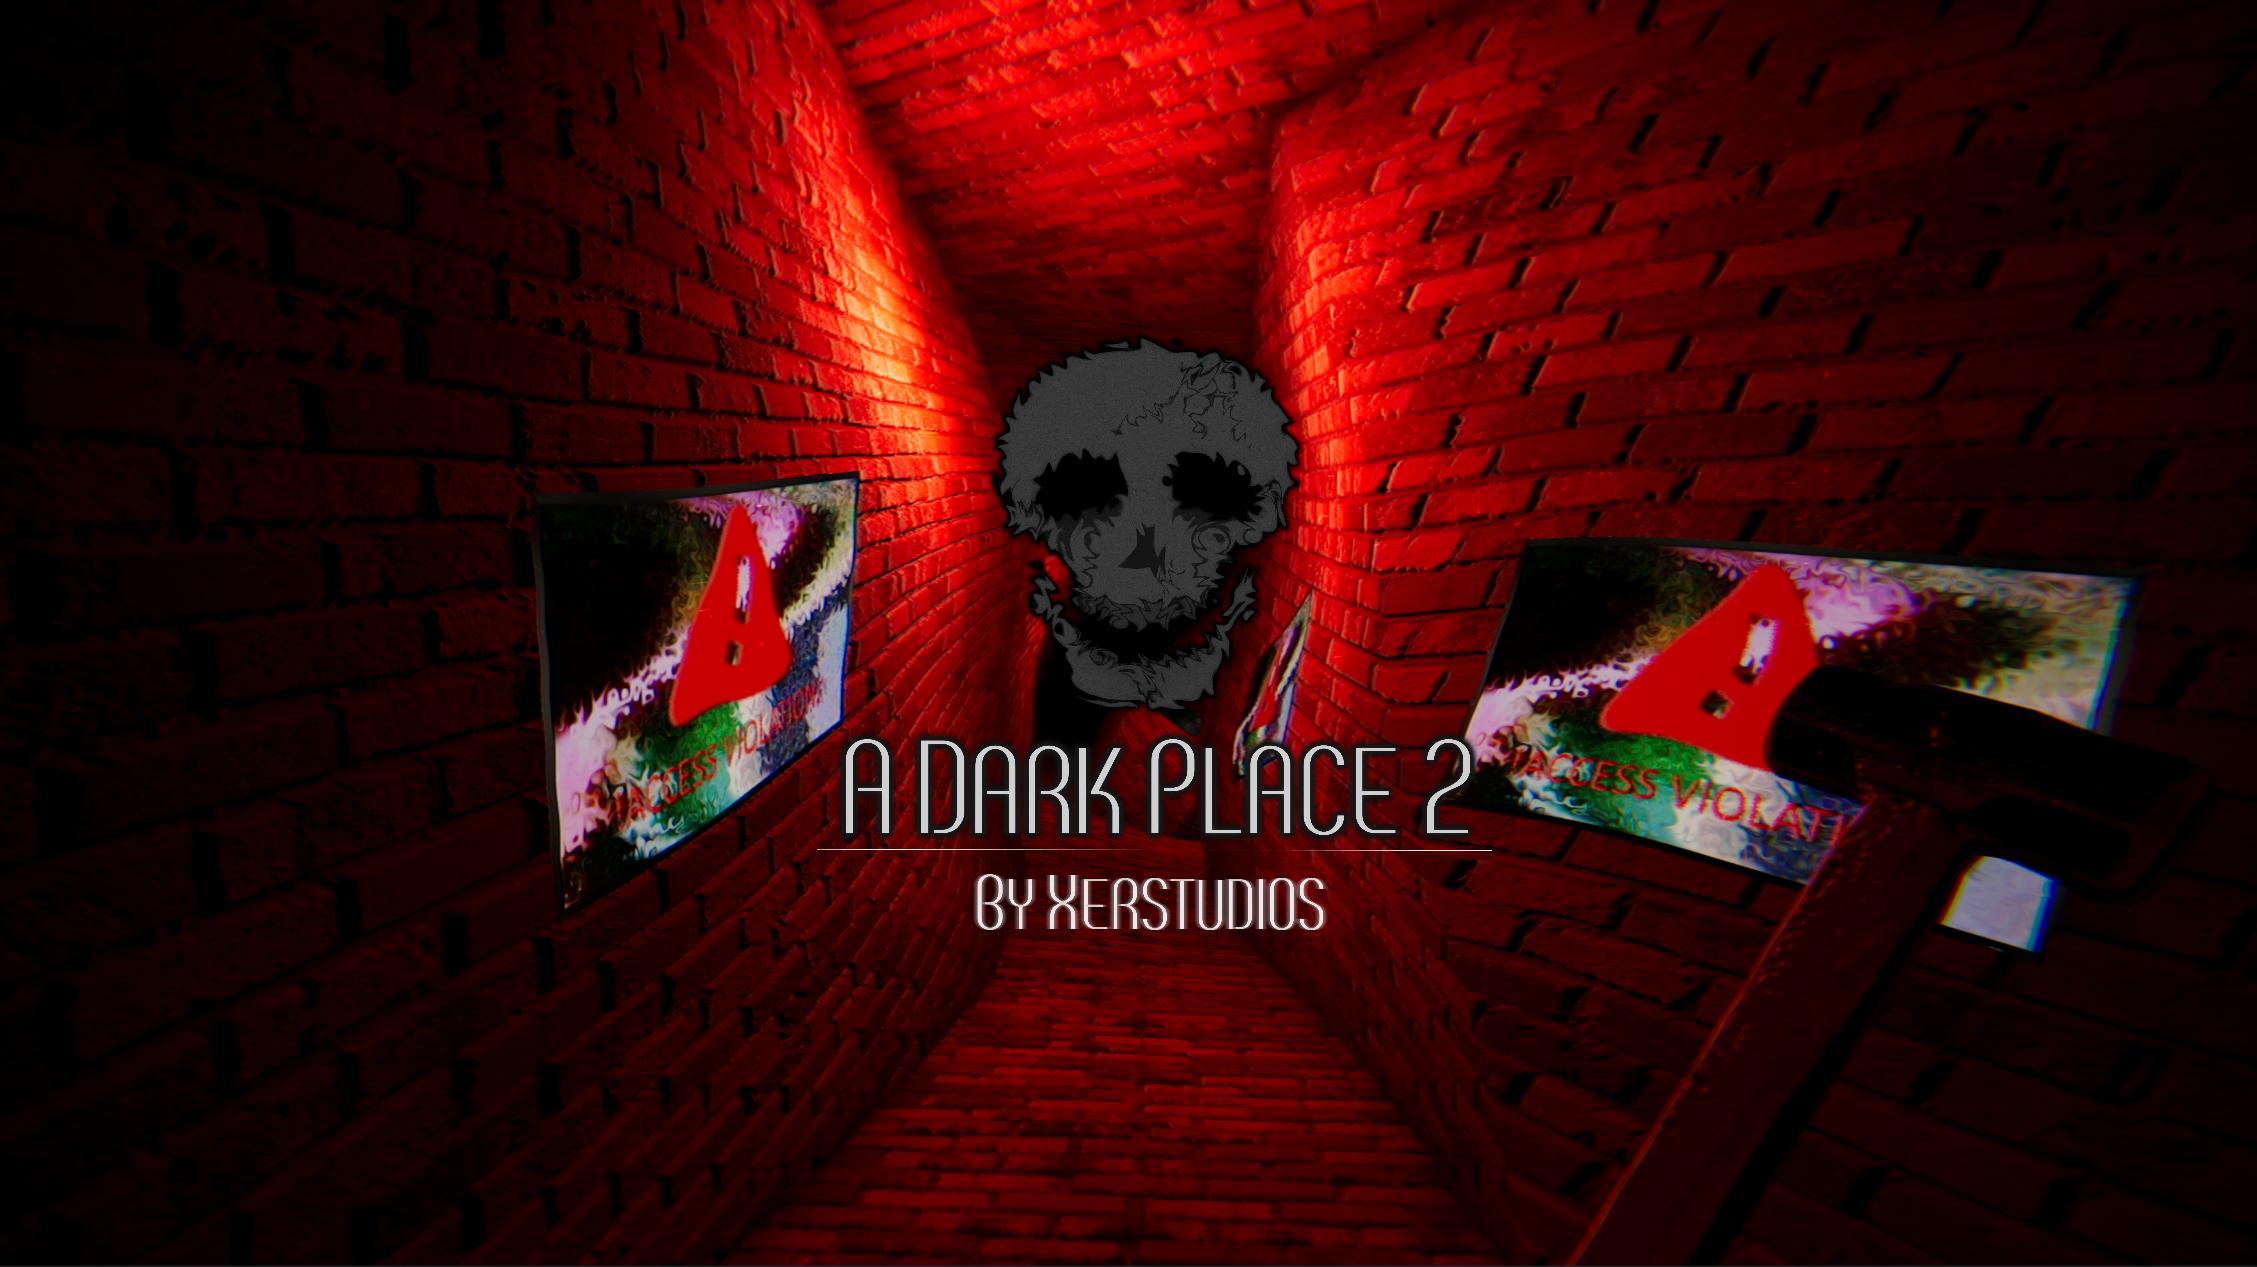 A Dark Place 2